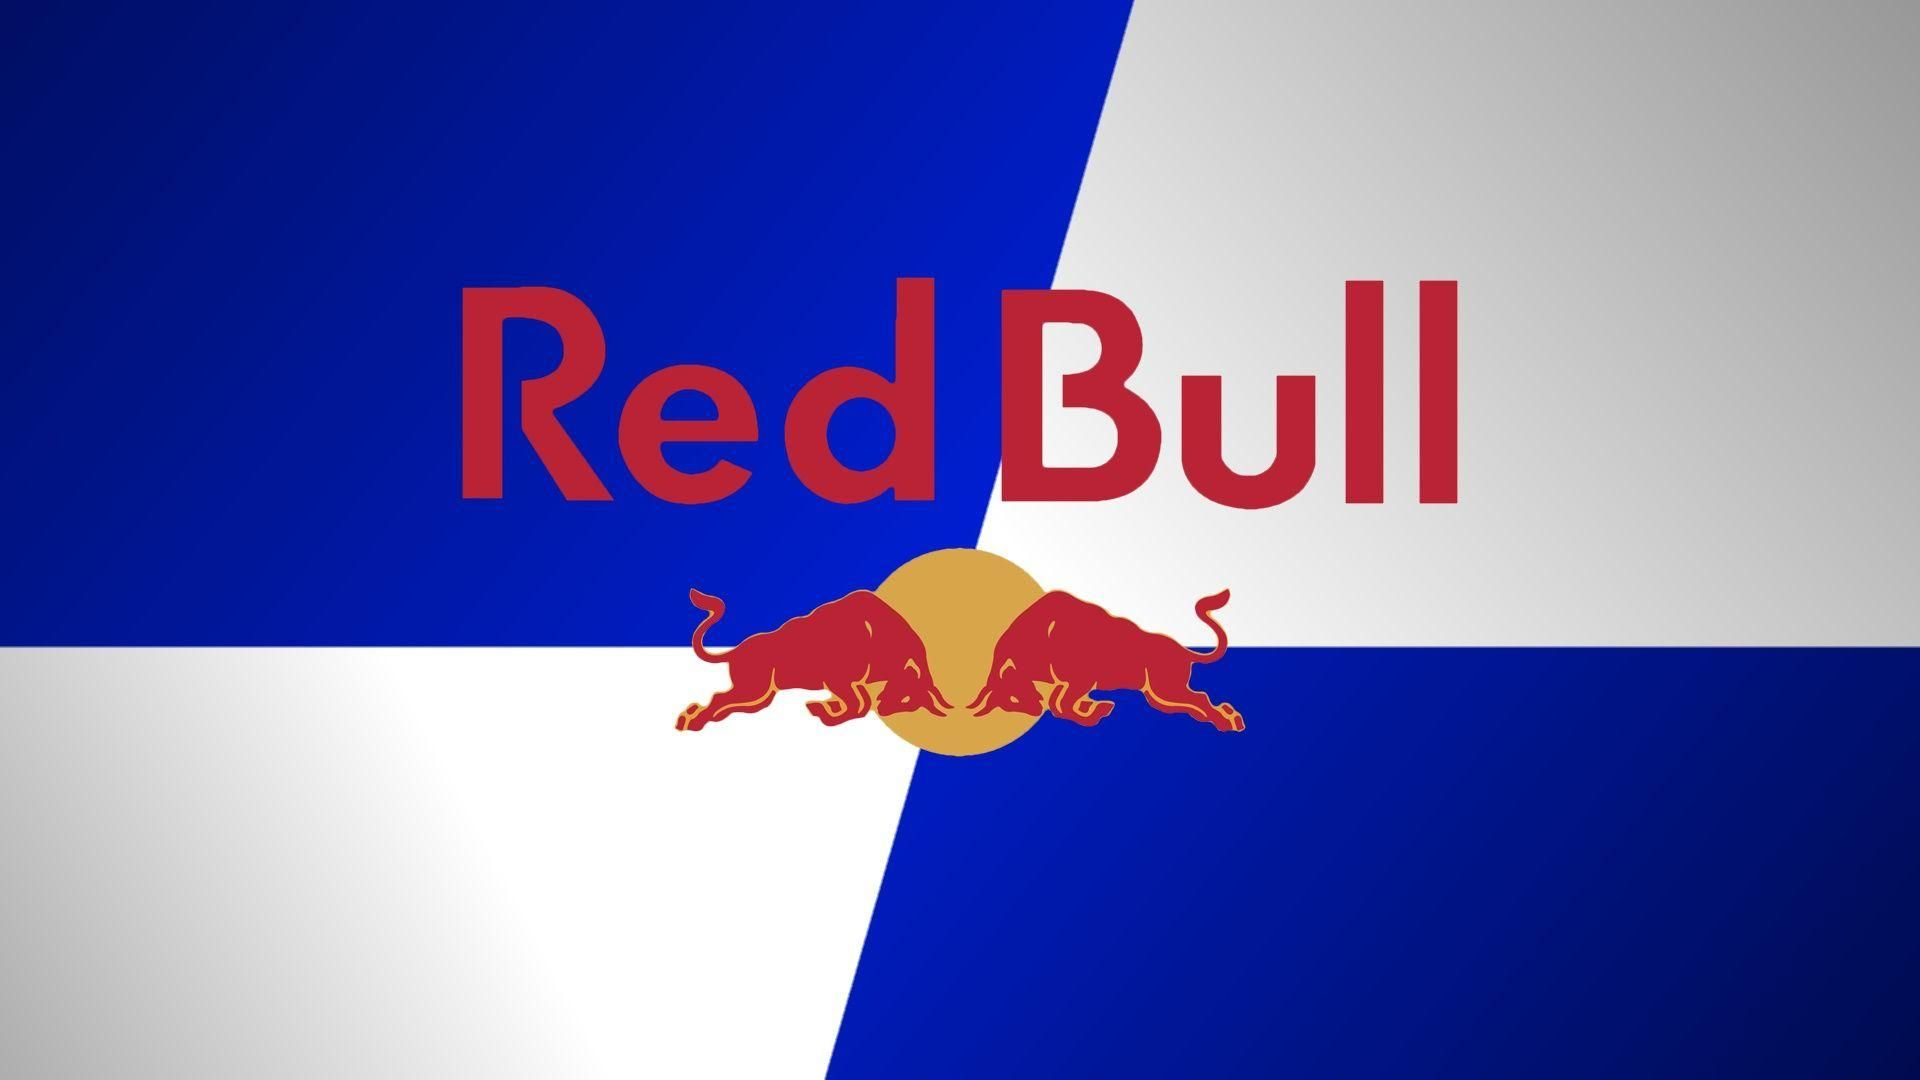 Bulls Logo Wallpapers 96 Wallpapers Hd Wallpapers Red Bull Bull Logo Bulls Wallpaper